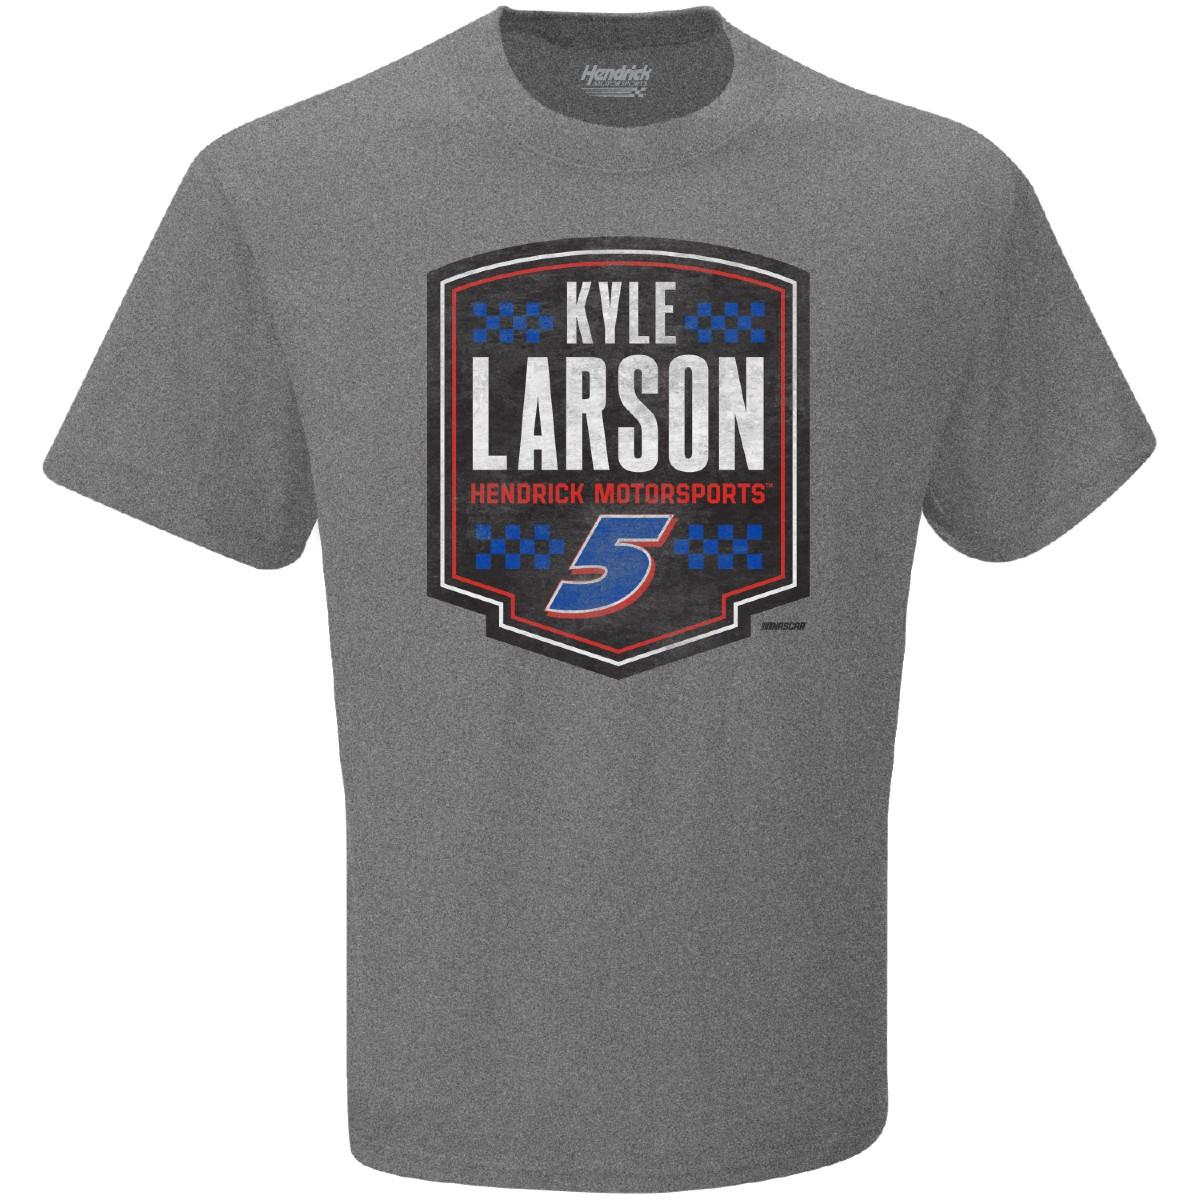 Kyle Larson #5 Shield Graphic Tee